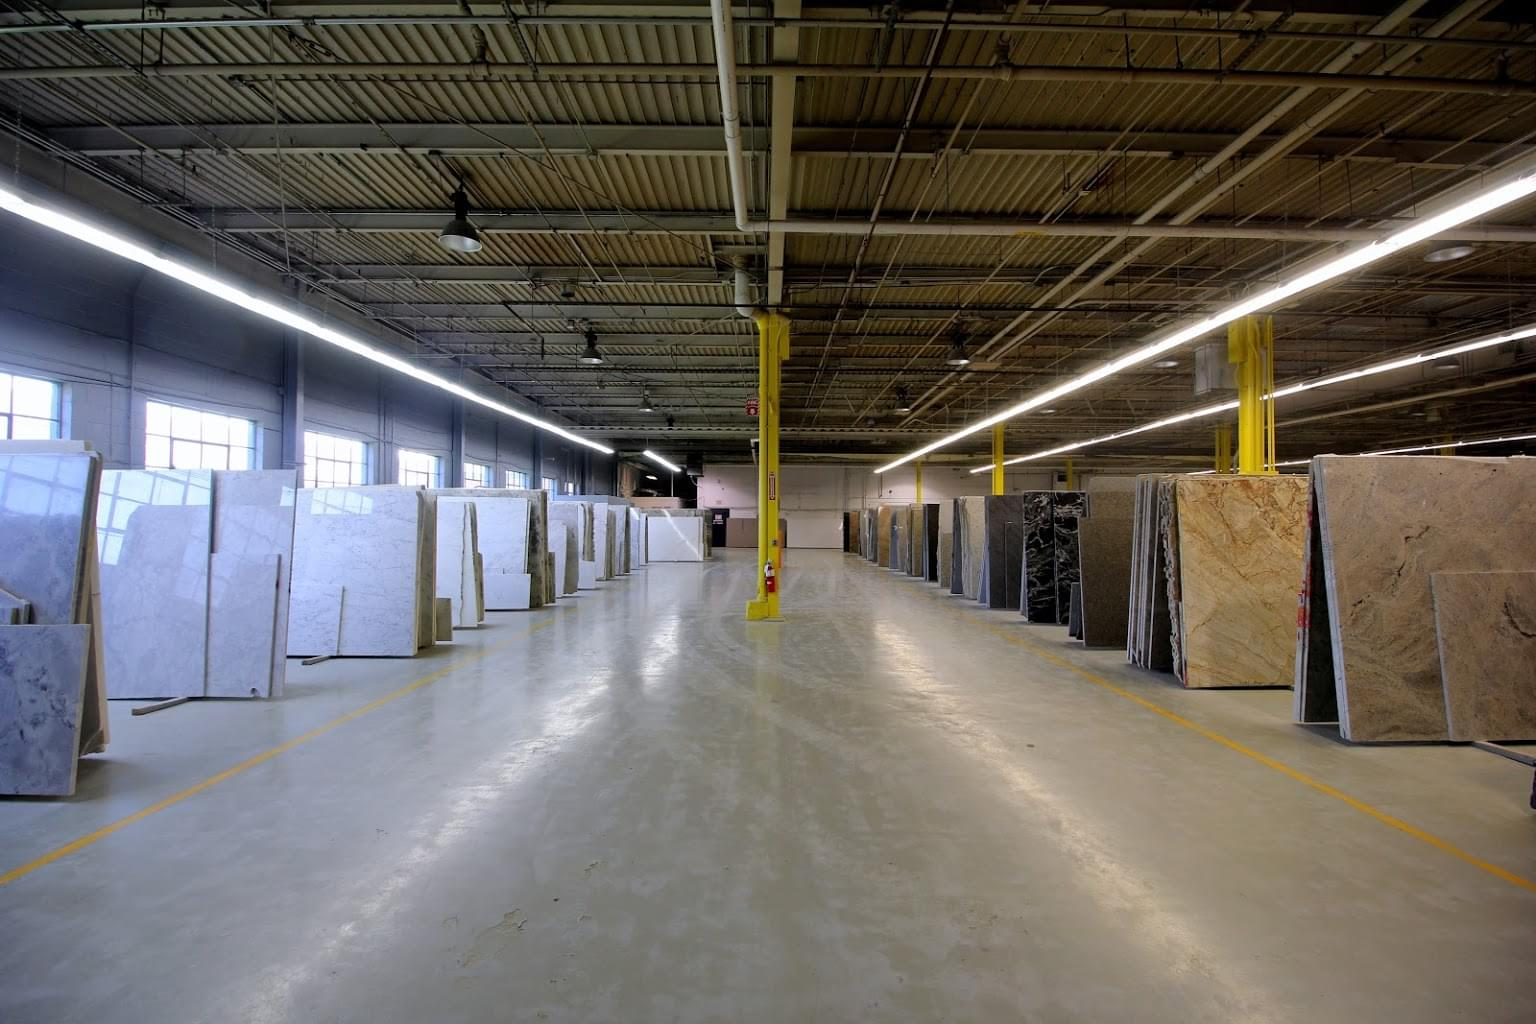 Granite Kitchen & Bath Clifton, NJ Granite Supplier warehouse display